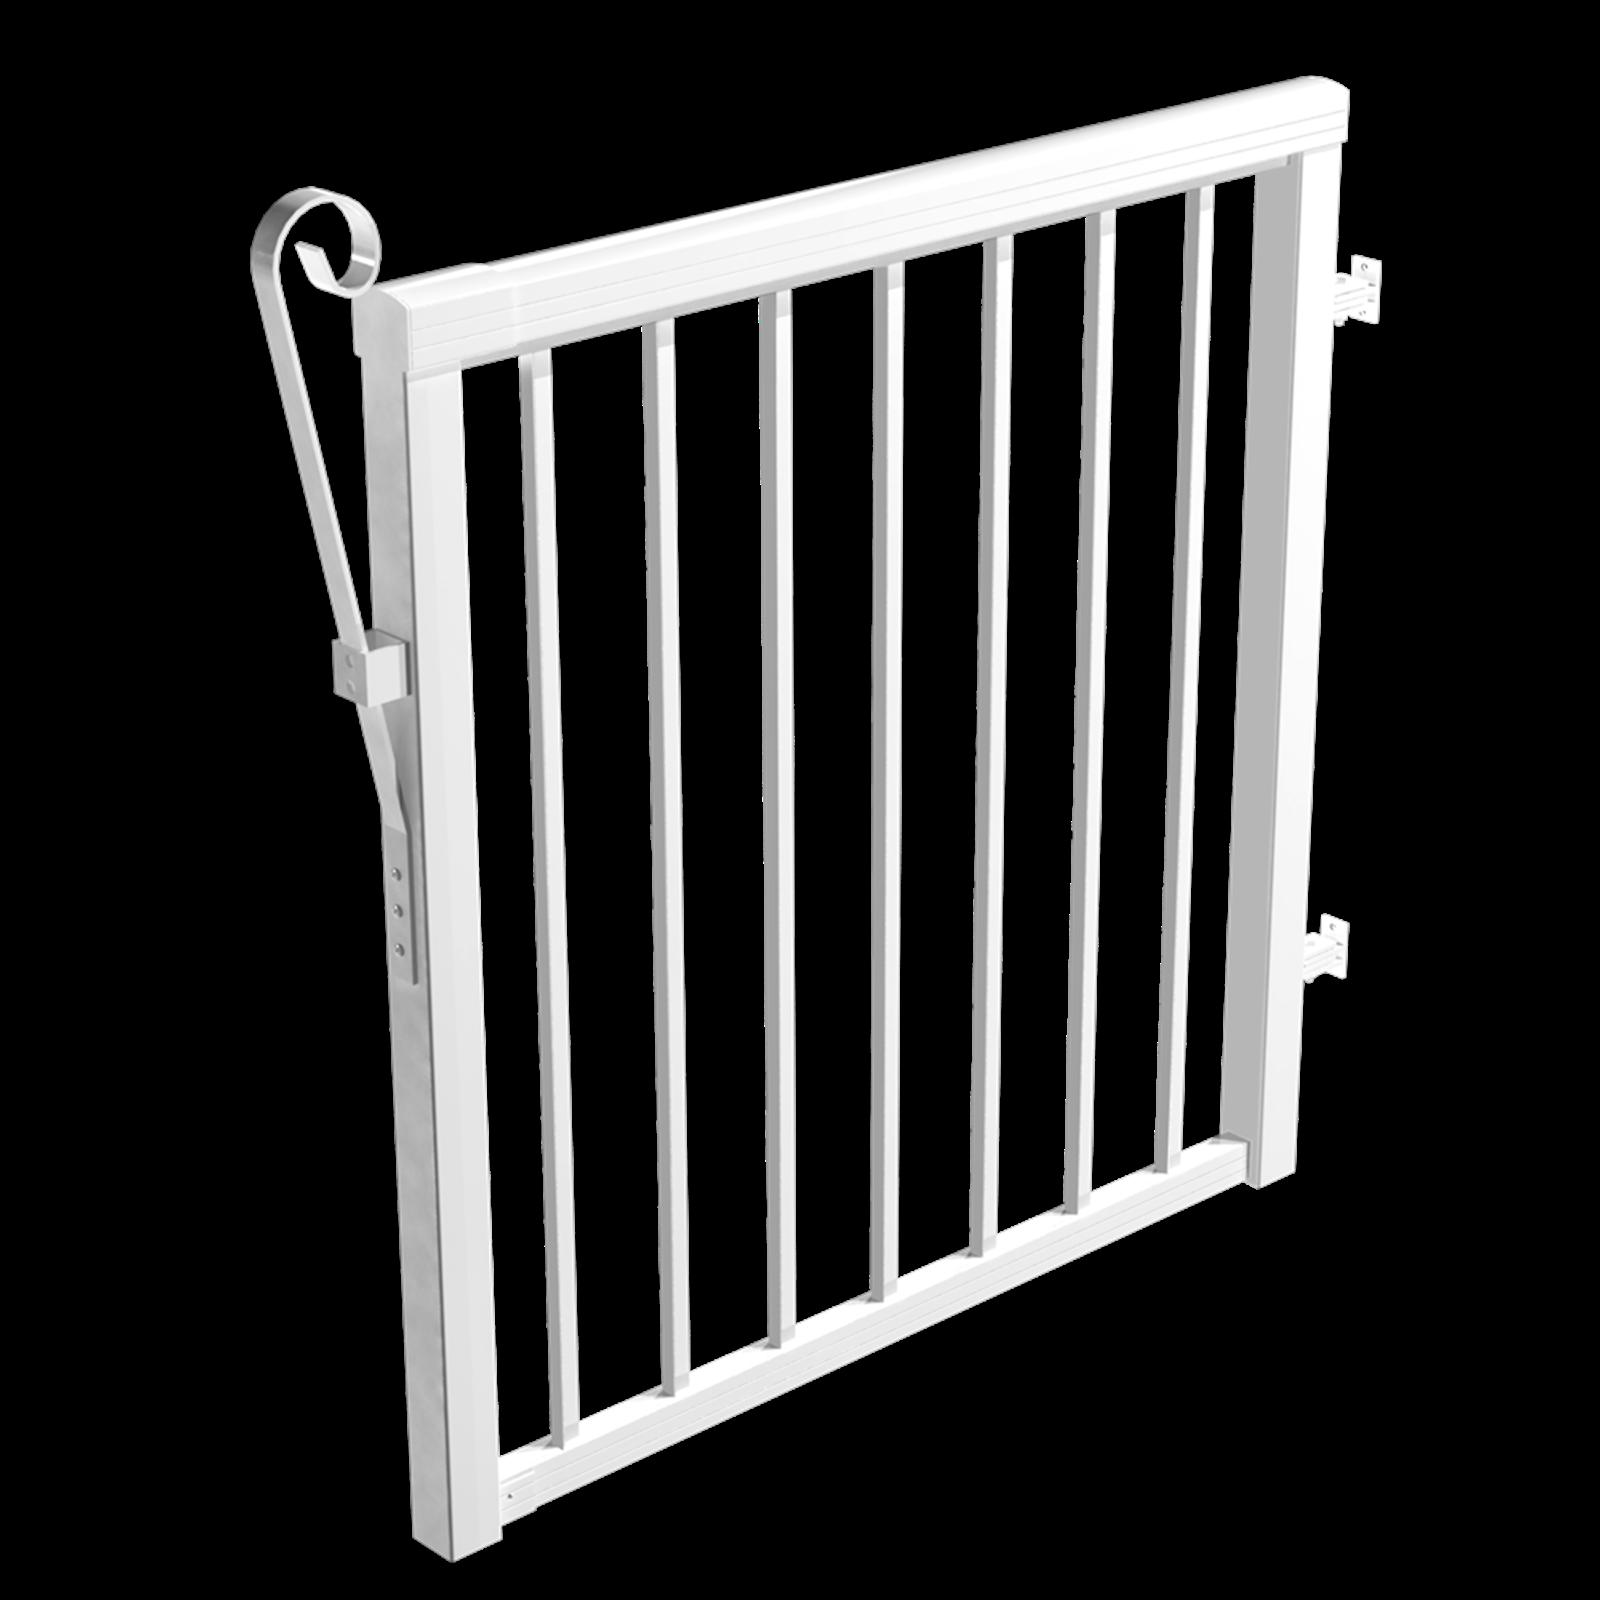 Peak 1000mm Aluminium Balustrade Standard Baluster Gate Kit